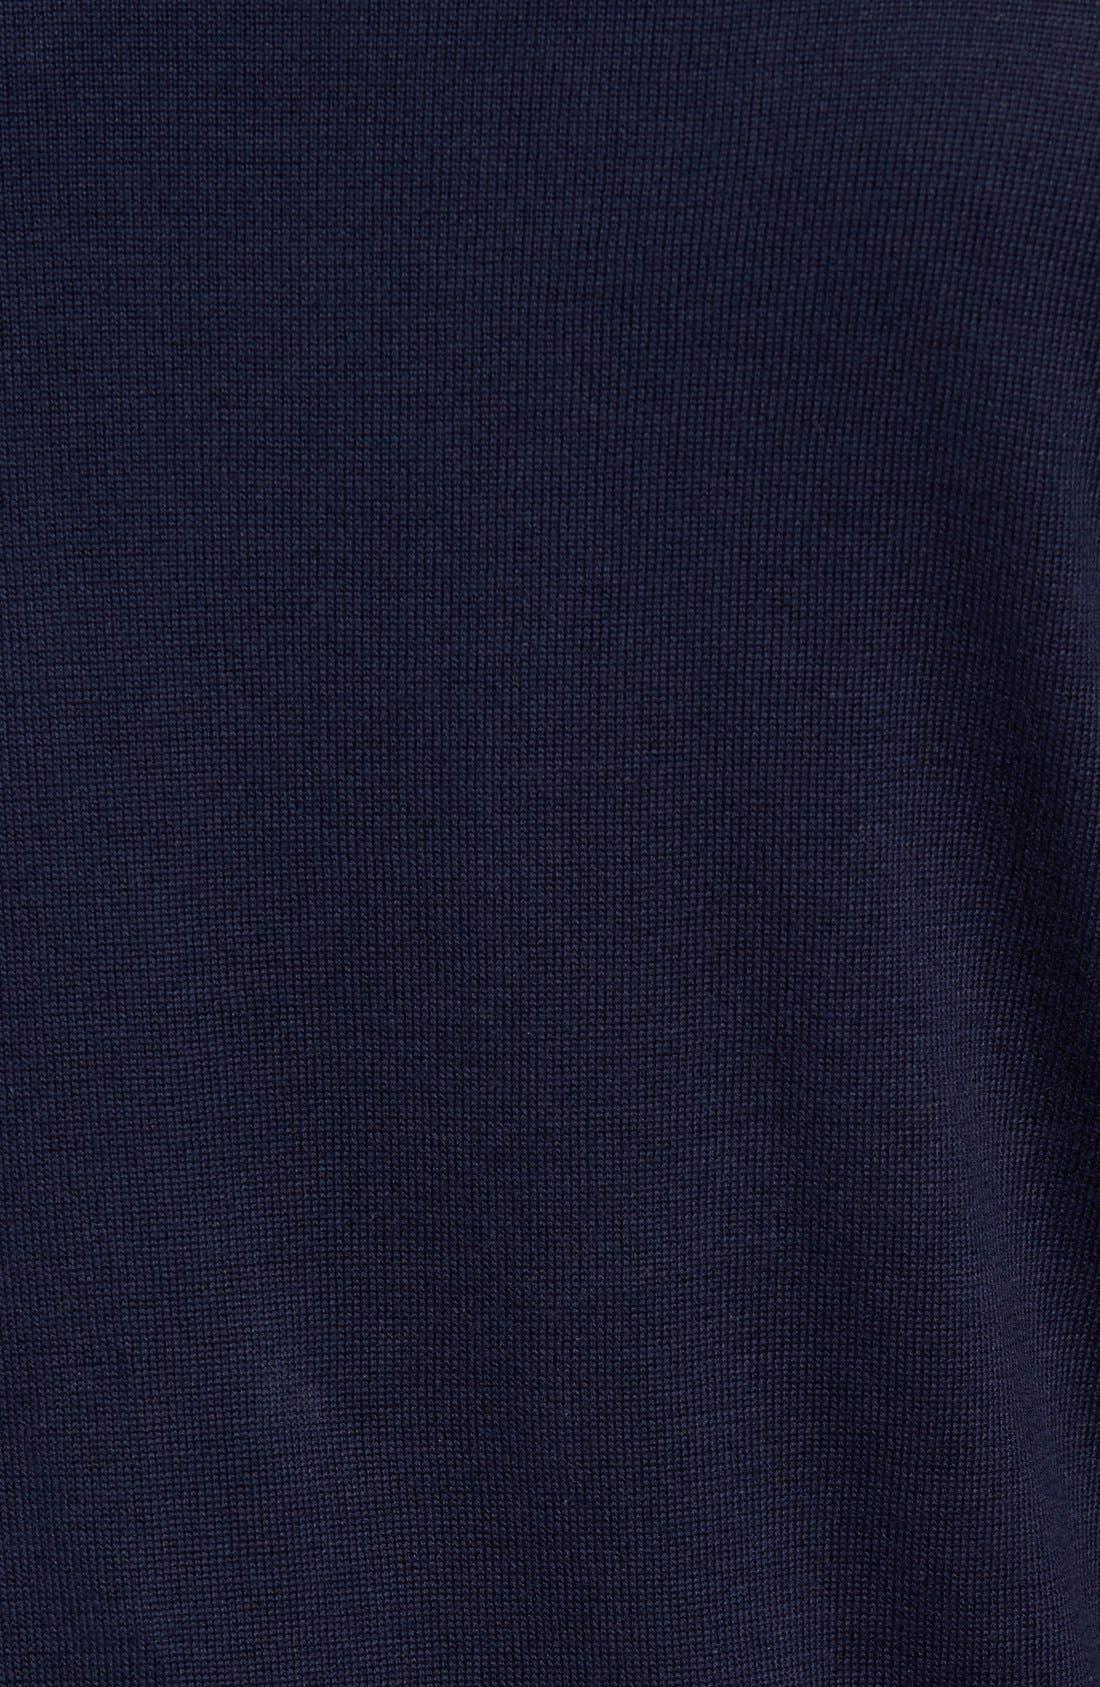 Cotton Jersey V-Neck Sweater,                             Alternate thumbnail 29, color,